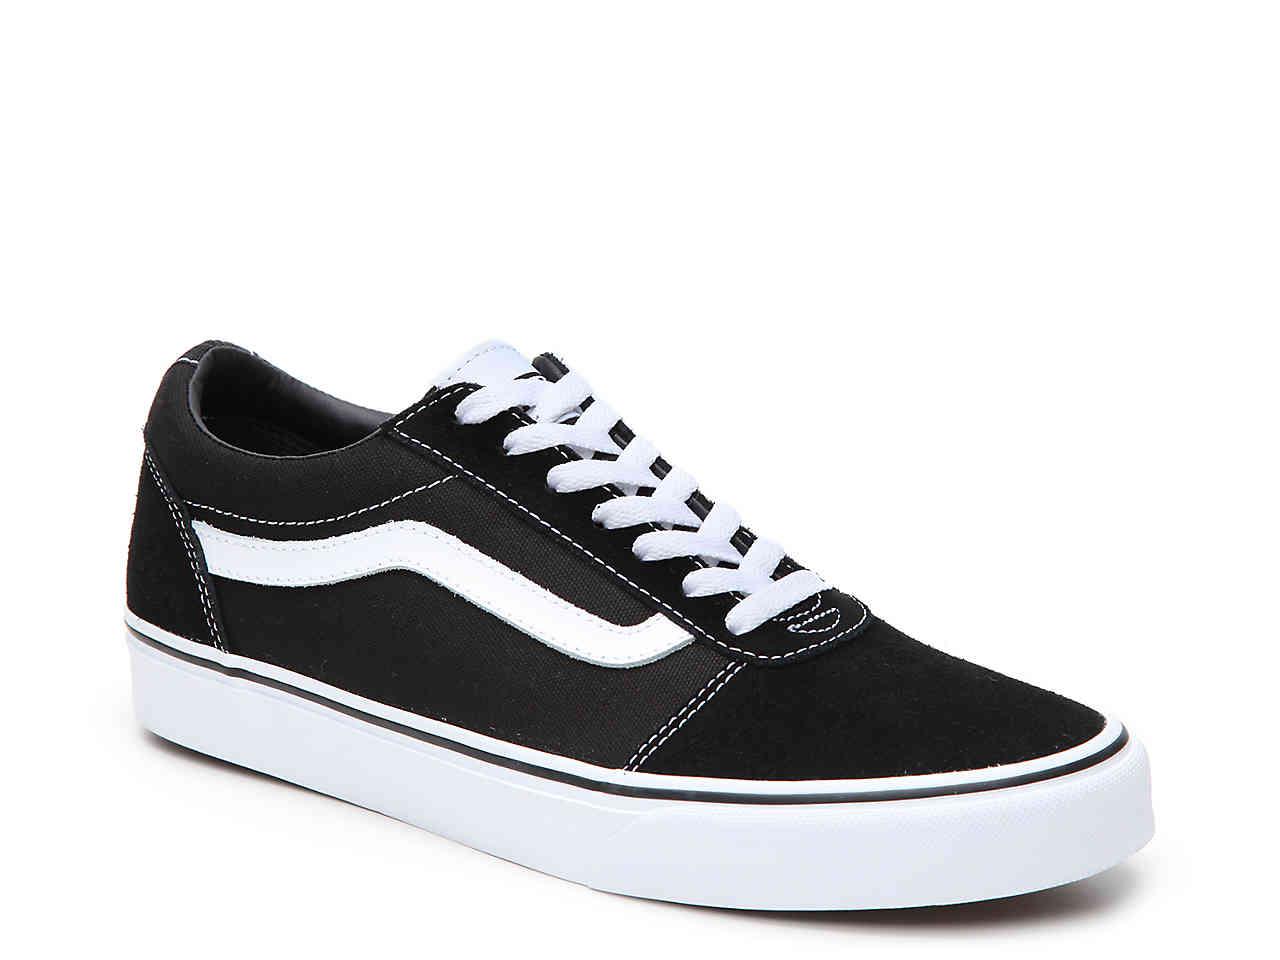 mens sneakers ward lo suede sneaker - menu0027s ppbllem